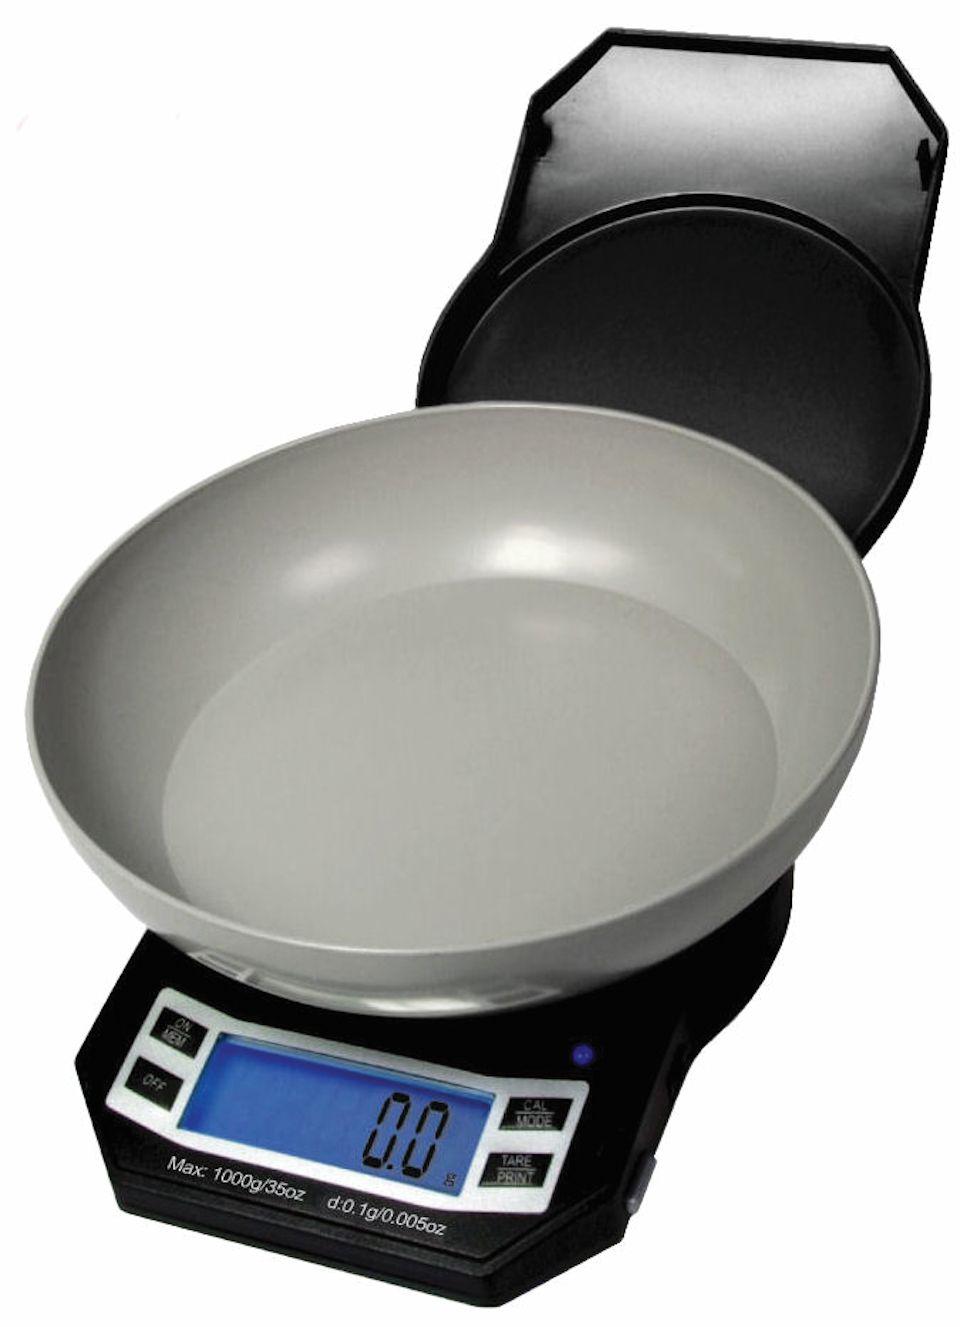 Scale Calibration Weights >> SB-1000 - Superior Balances